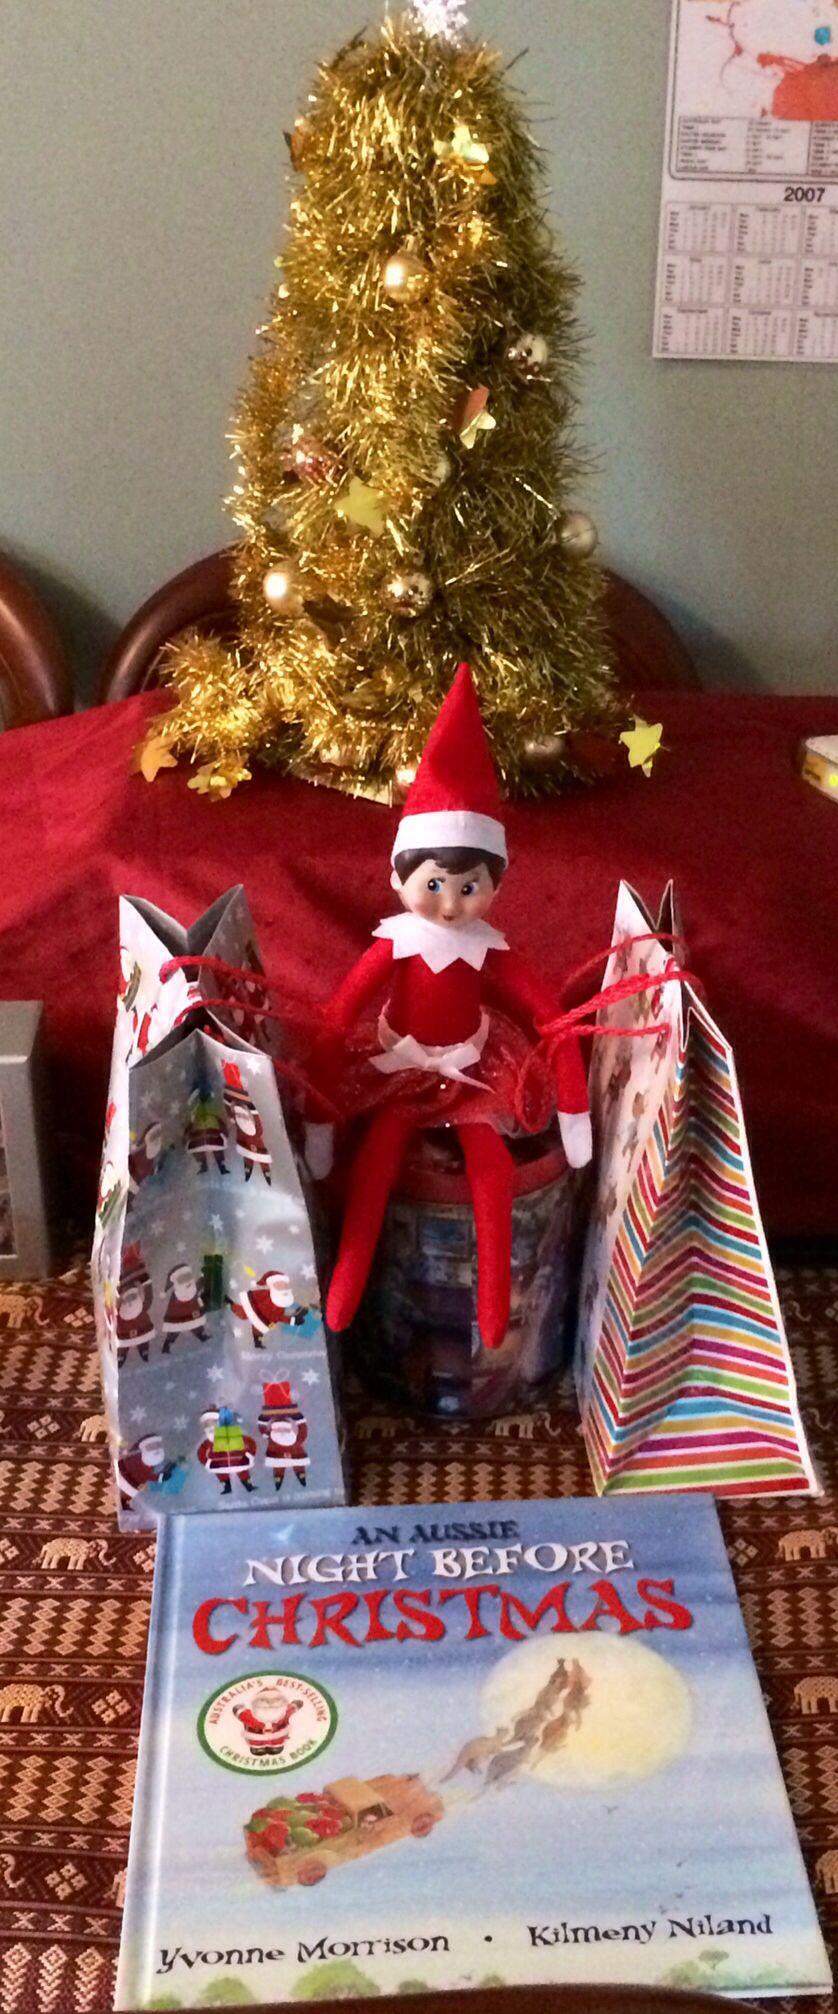 Day 24, Christmas Eve 2013. Ellie Elf on the Shelf has